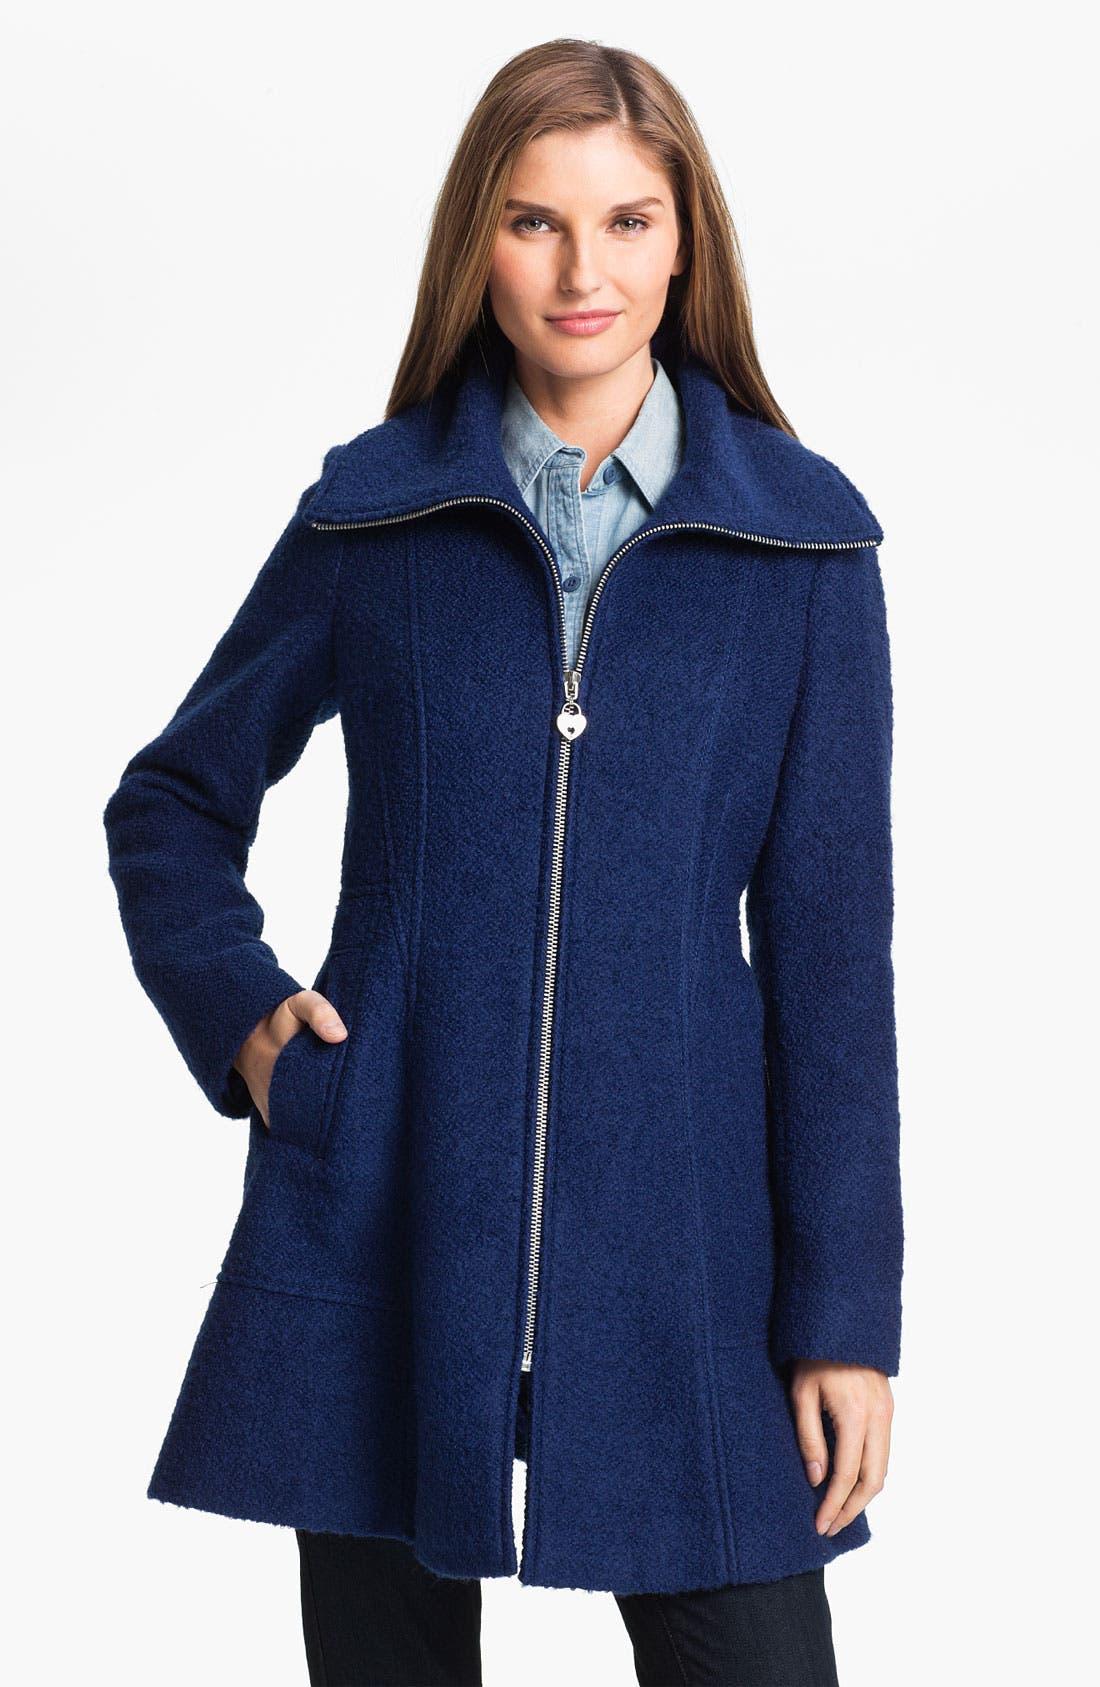 Alternate Image 1 Selected - GUESS Bouclé Walking Coat (Petite) (Online Exclusive)